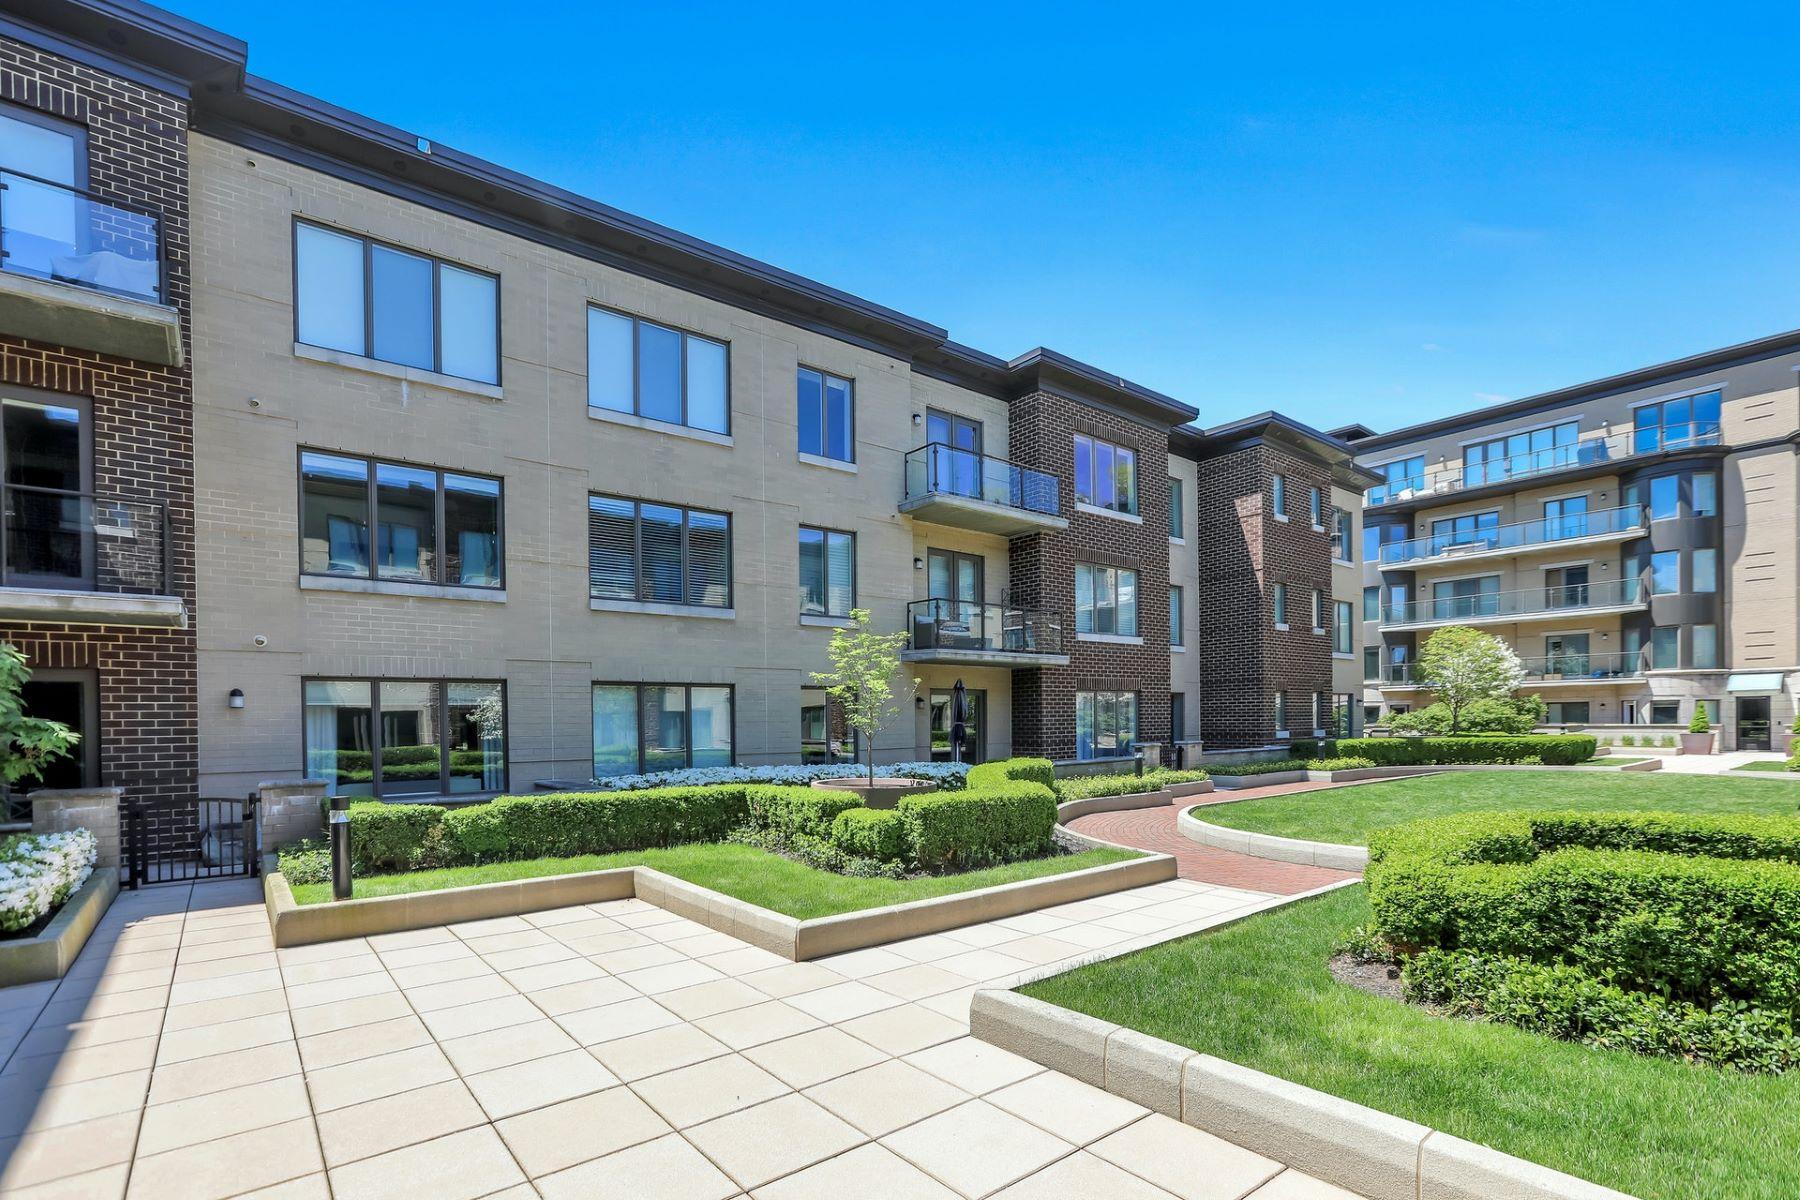 Condominiums 为 销售 在 Unique Opportunity! 250 Henley Pl 206, 维霍肯, 新泽西州 07086 美国